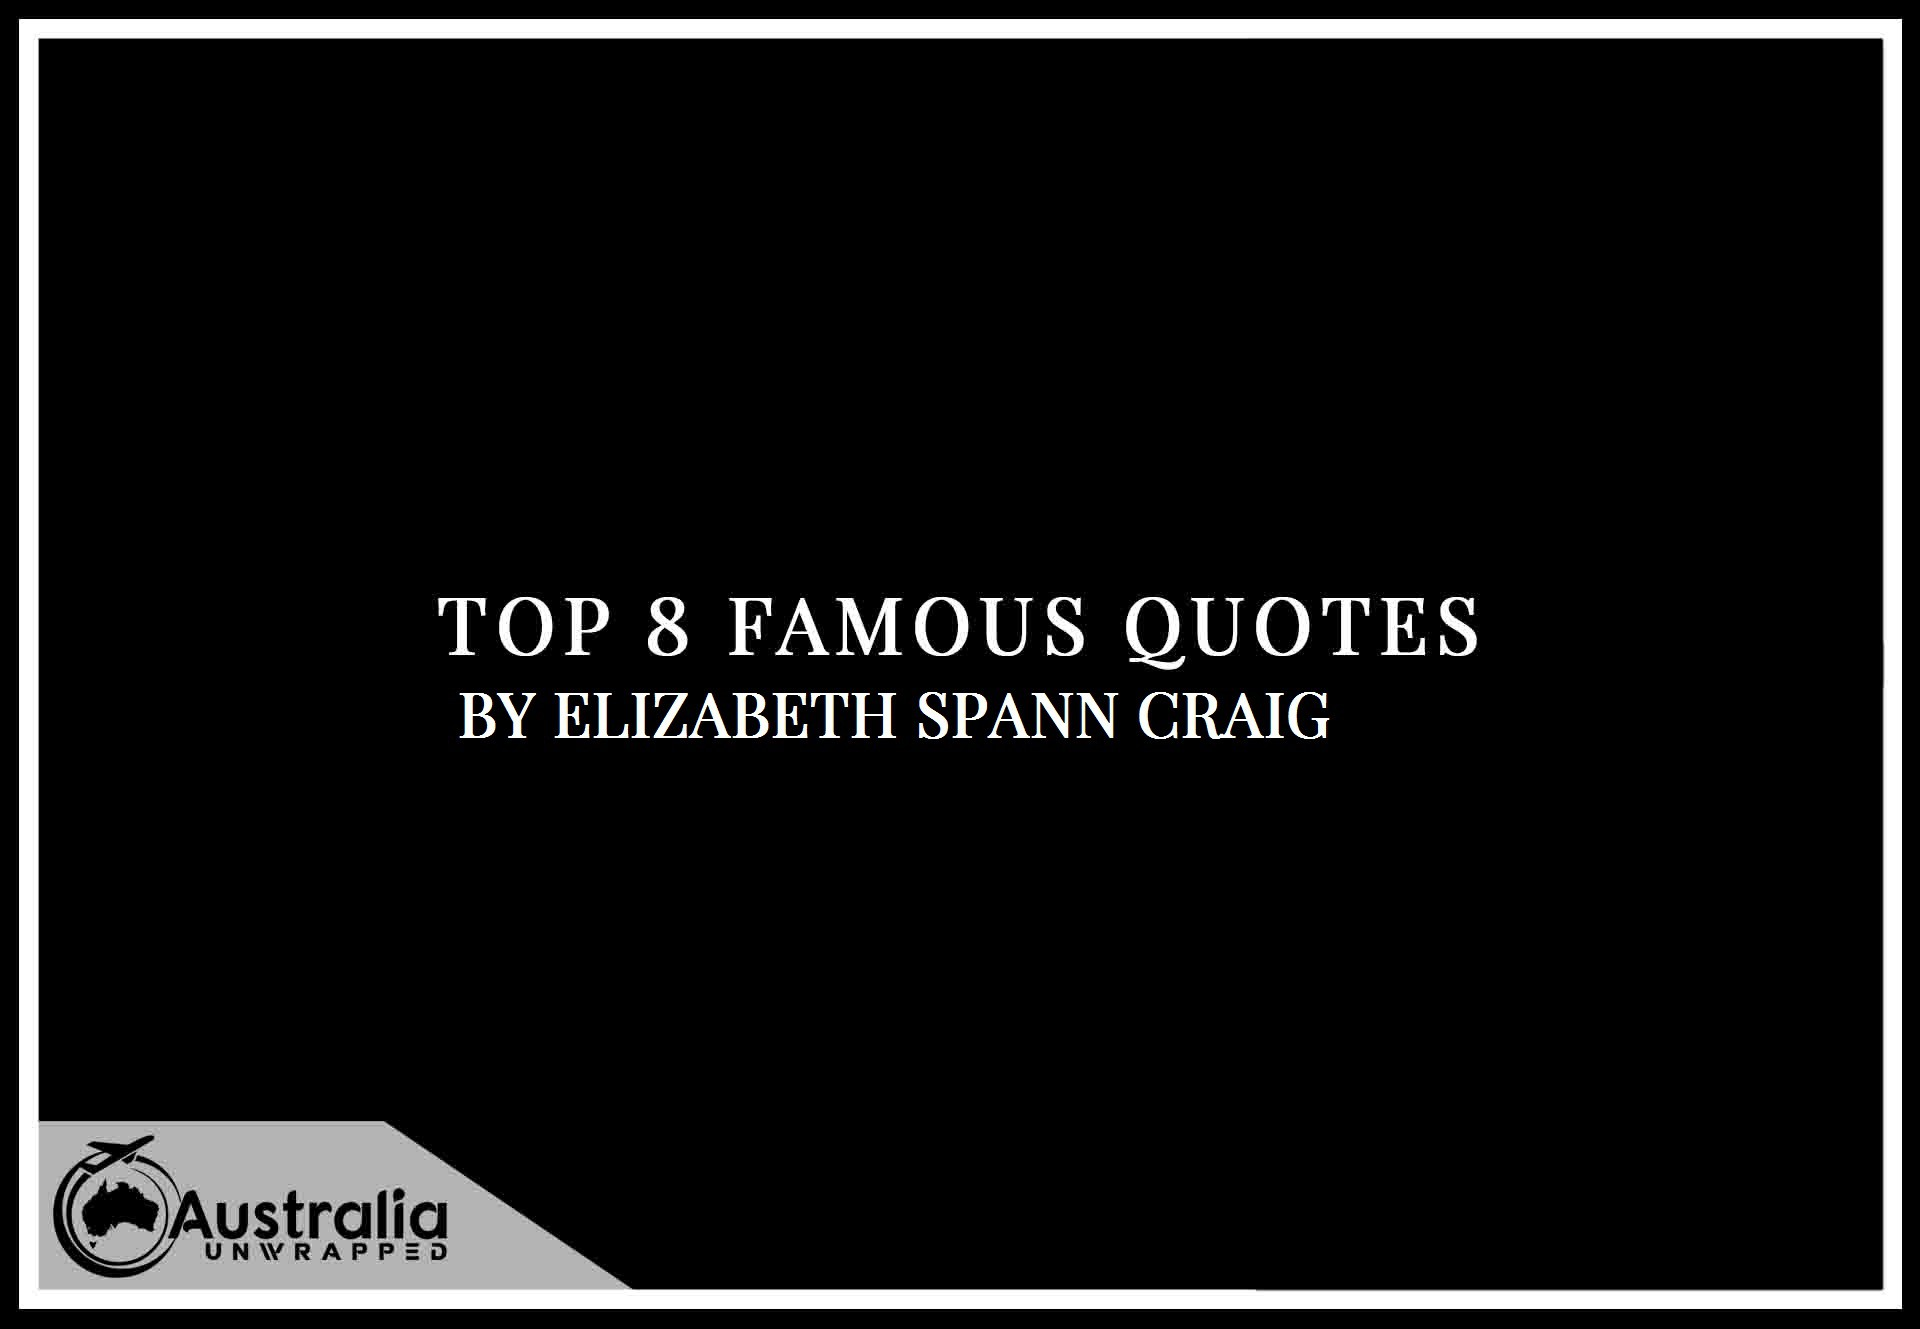 Elizabeth Craig's Top 8 Popular and Famous Quotes